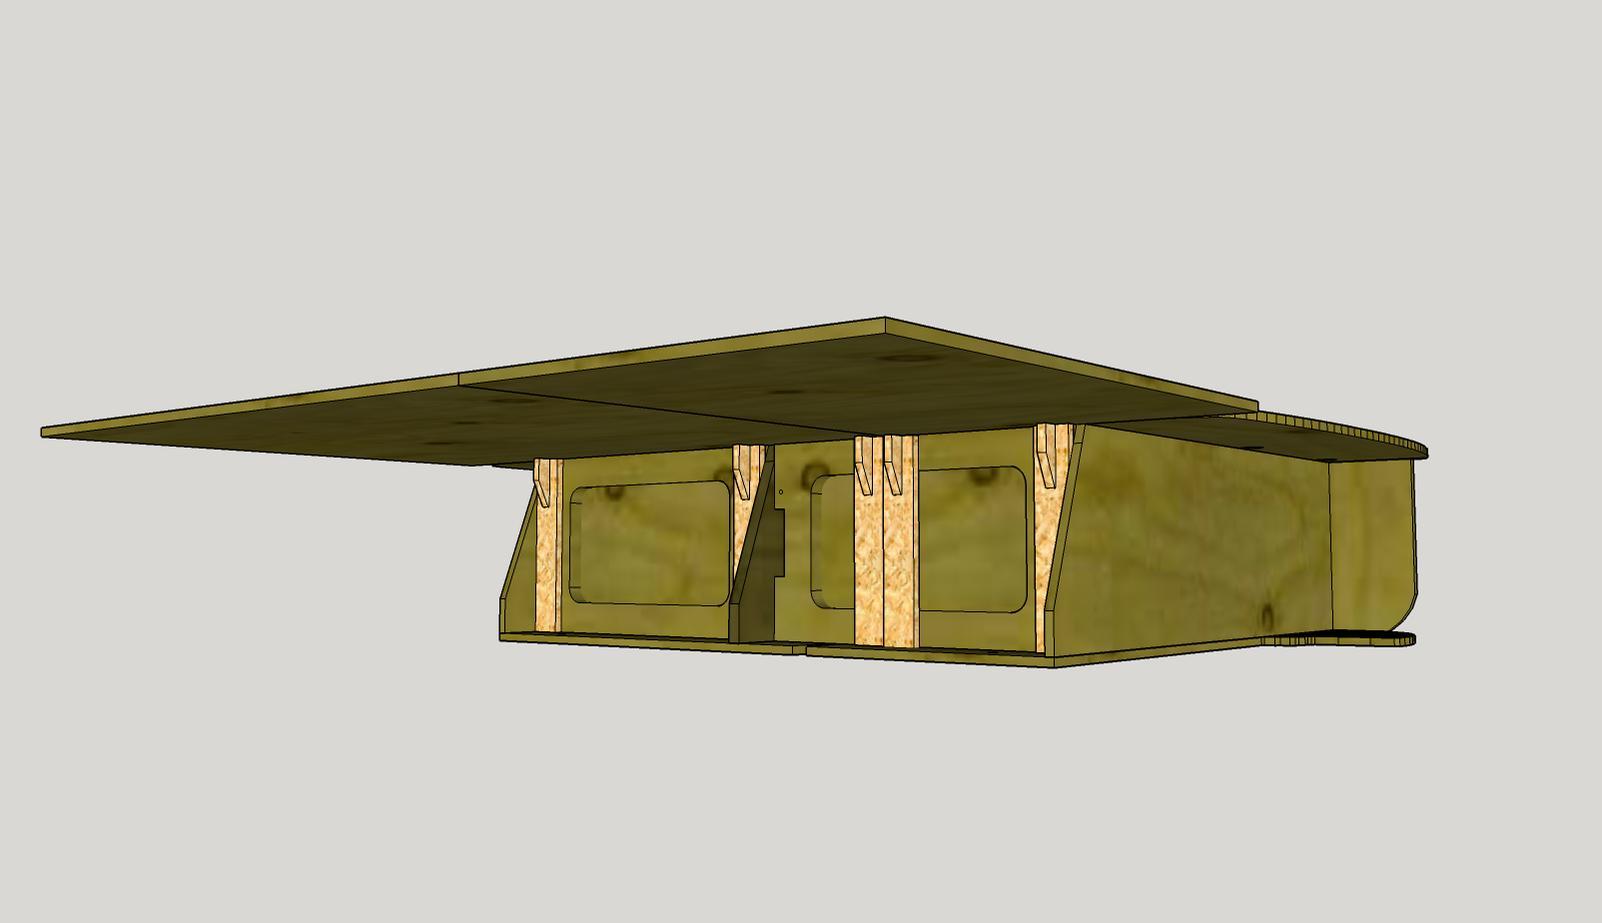 4th Gen Camping/Storage System - DIY- Free plans!-rm_4gent4rdrawers4_platformlegsdvrsidelow-jpg